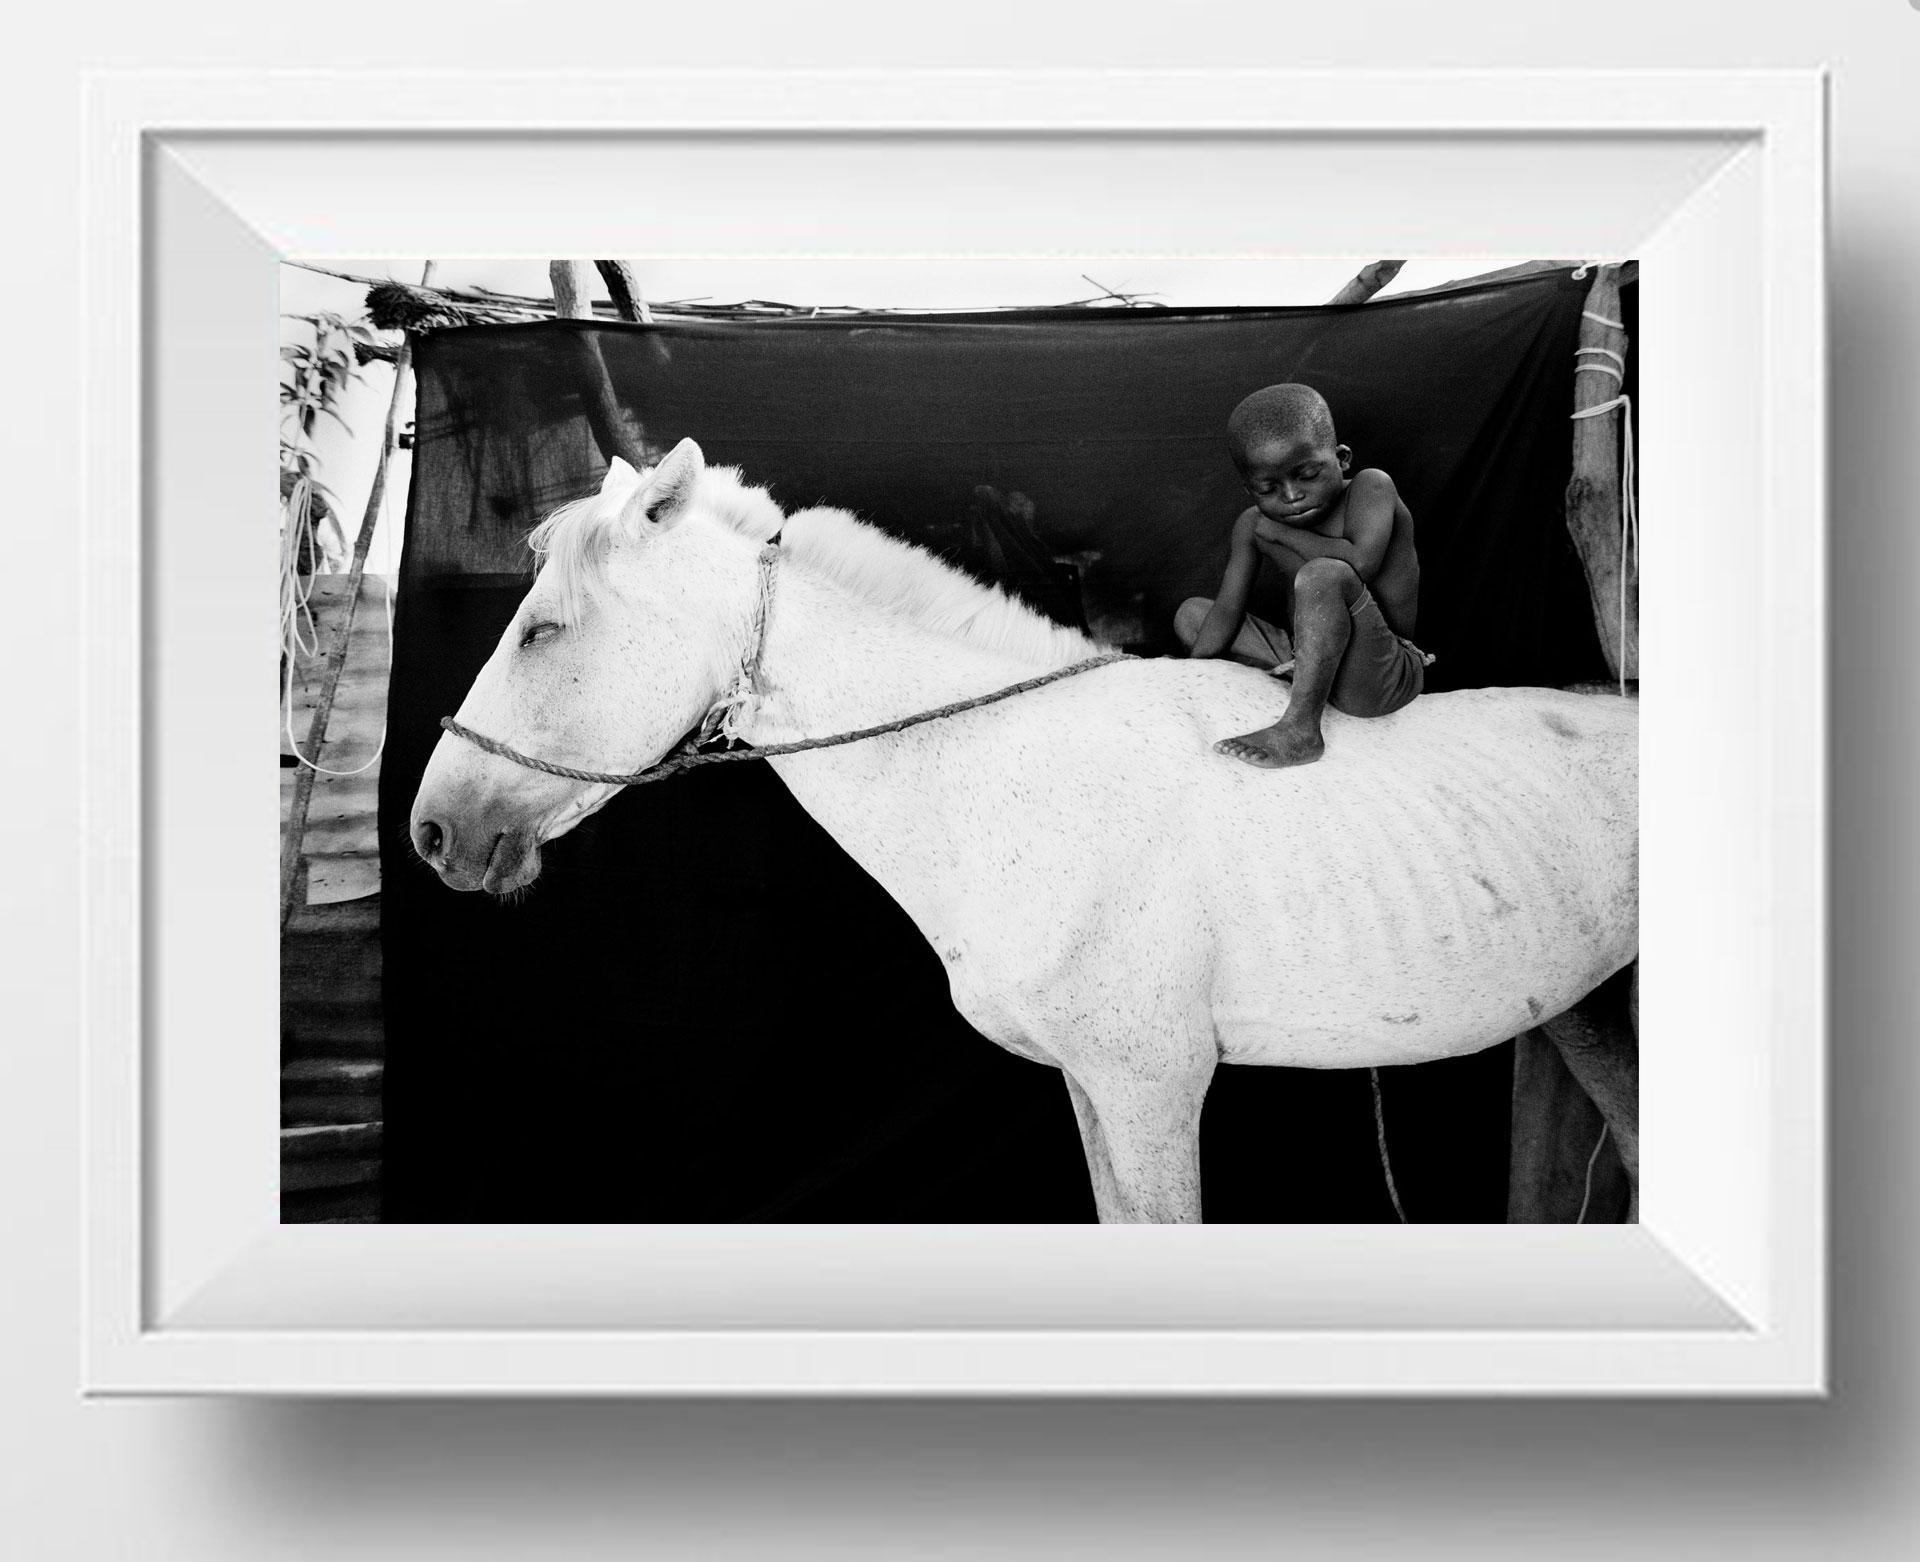 ©JASON FLORIO - 'ISMAILA ON HIS WHITE HORSE, JUMPEX'. Black & white framed photography prints -small boy on horseback